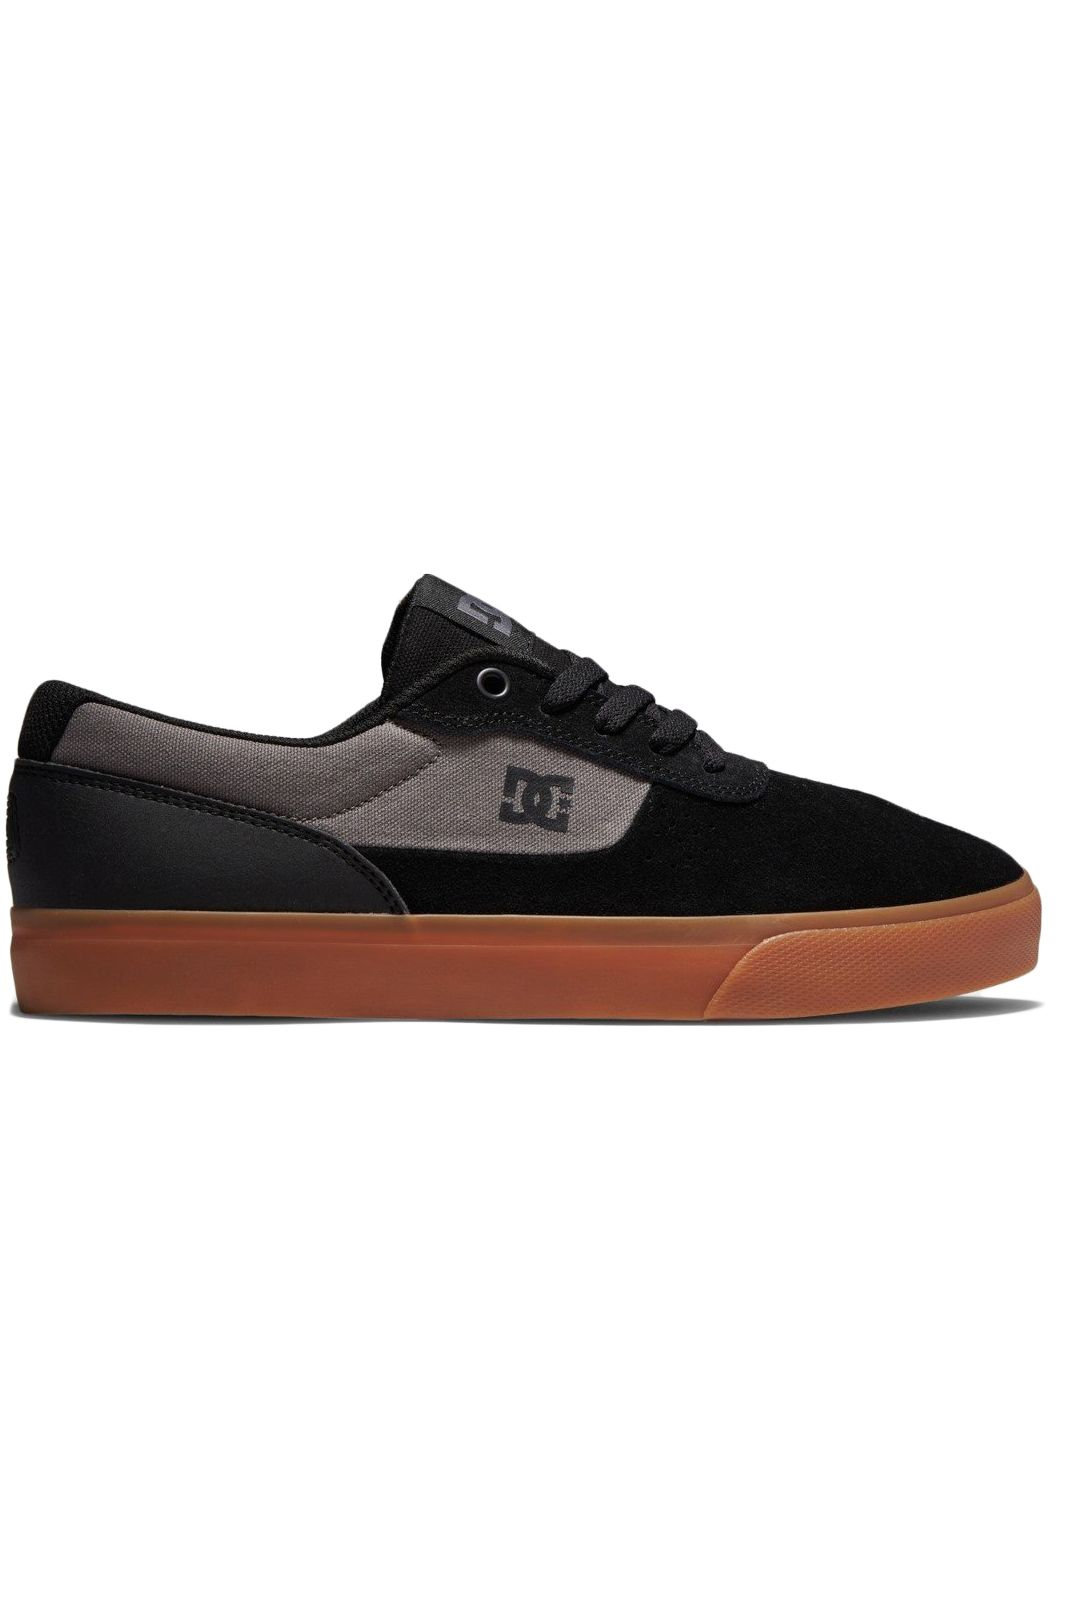 DC Shoes Shoes SWITCH Black/Black/Dk Grey